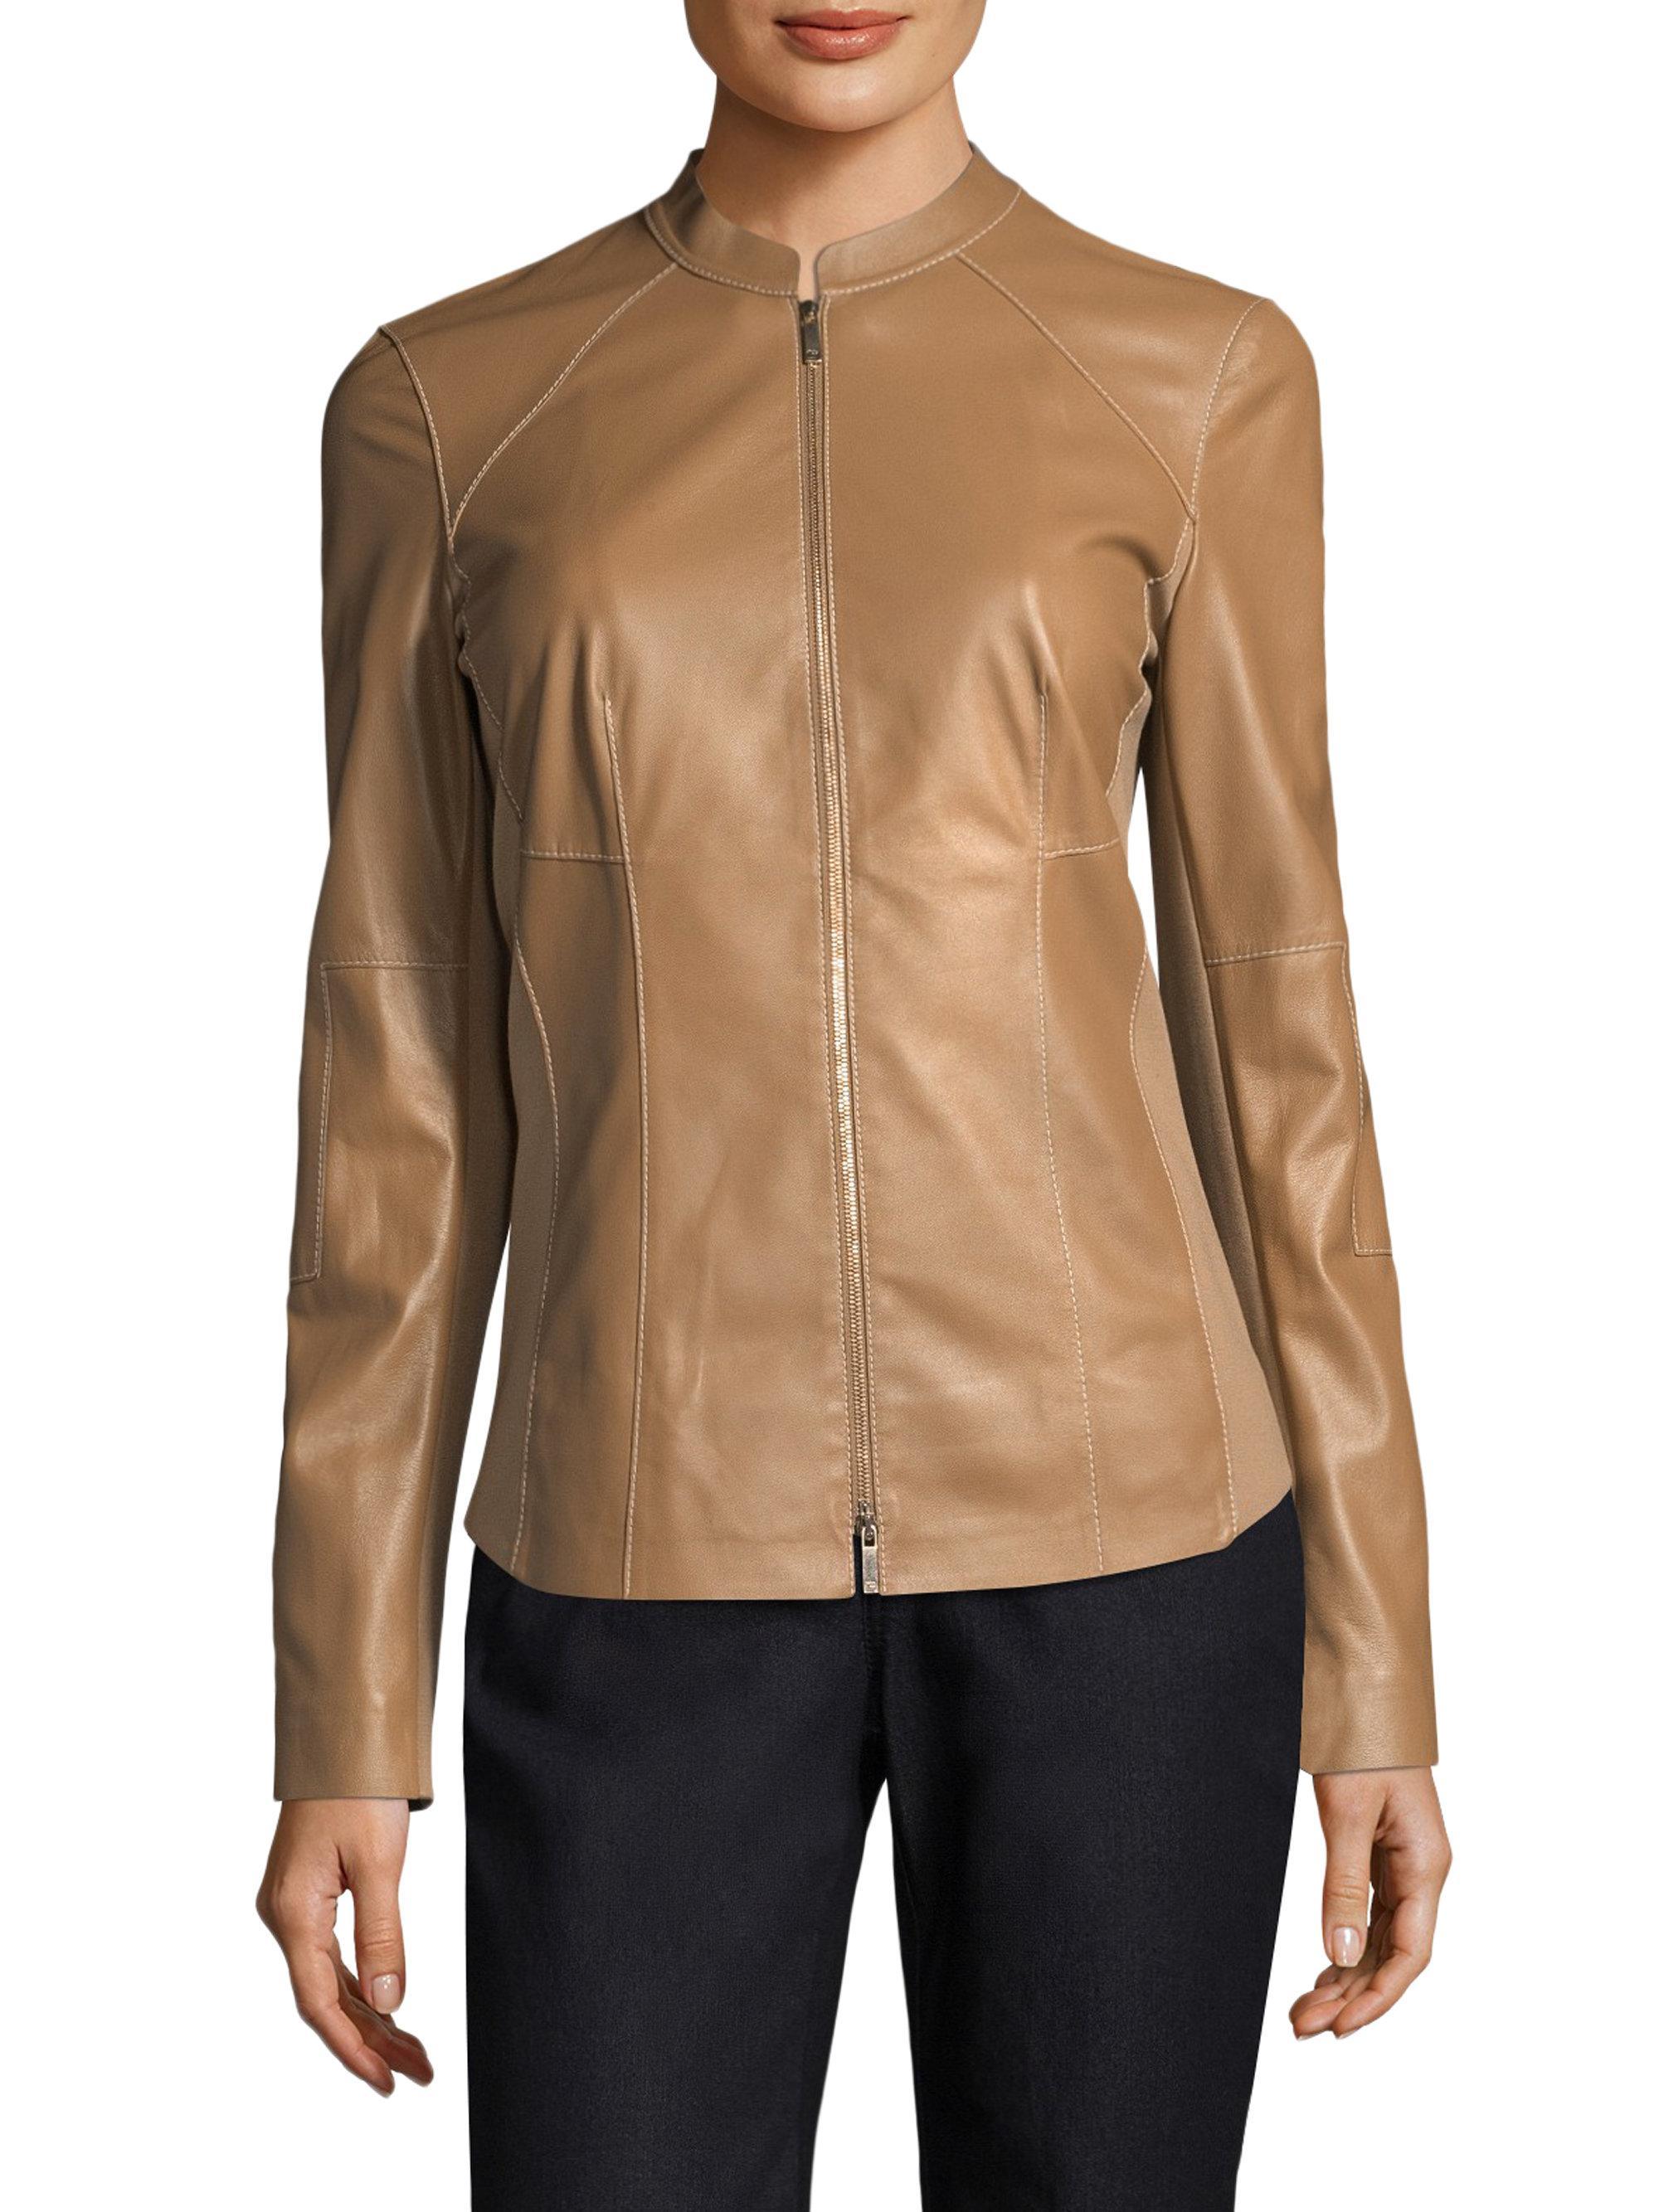 Lafayette leather jacket